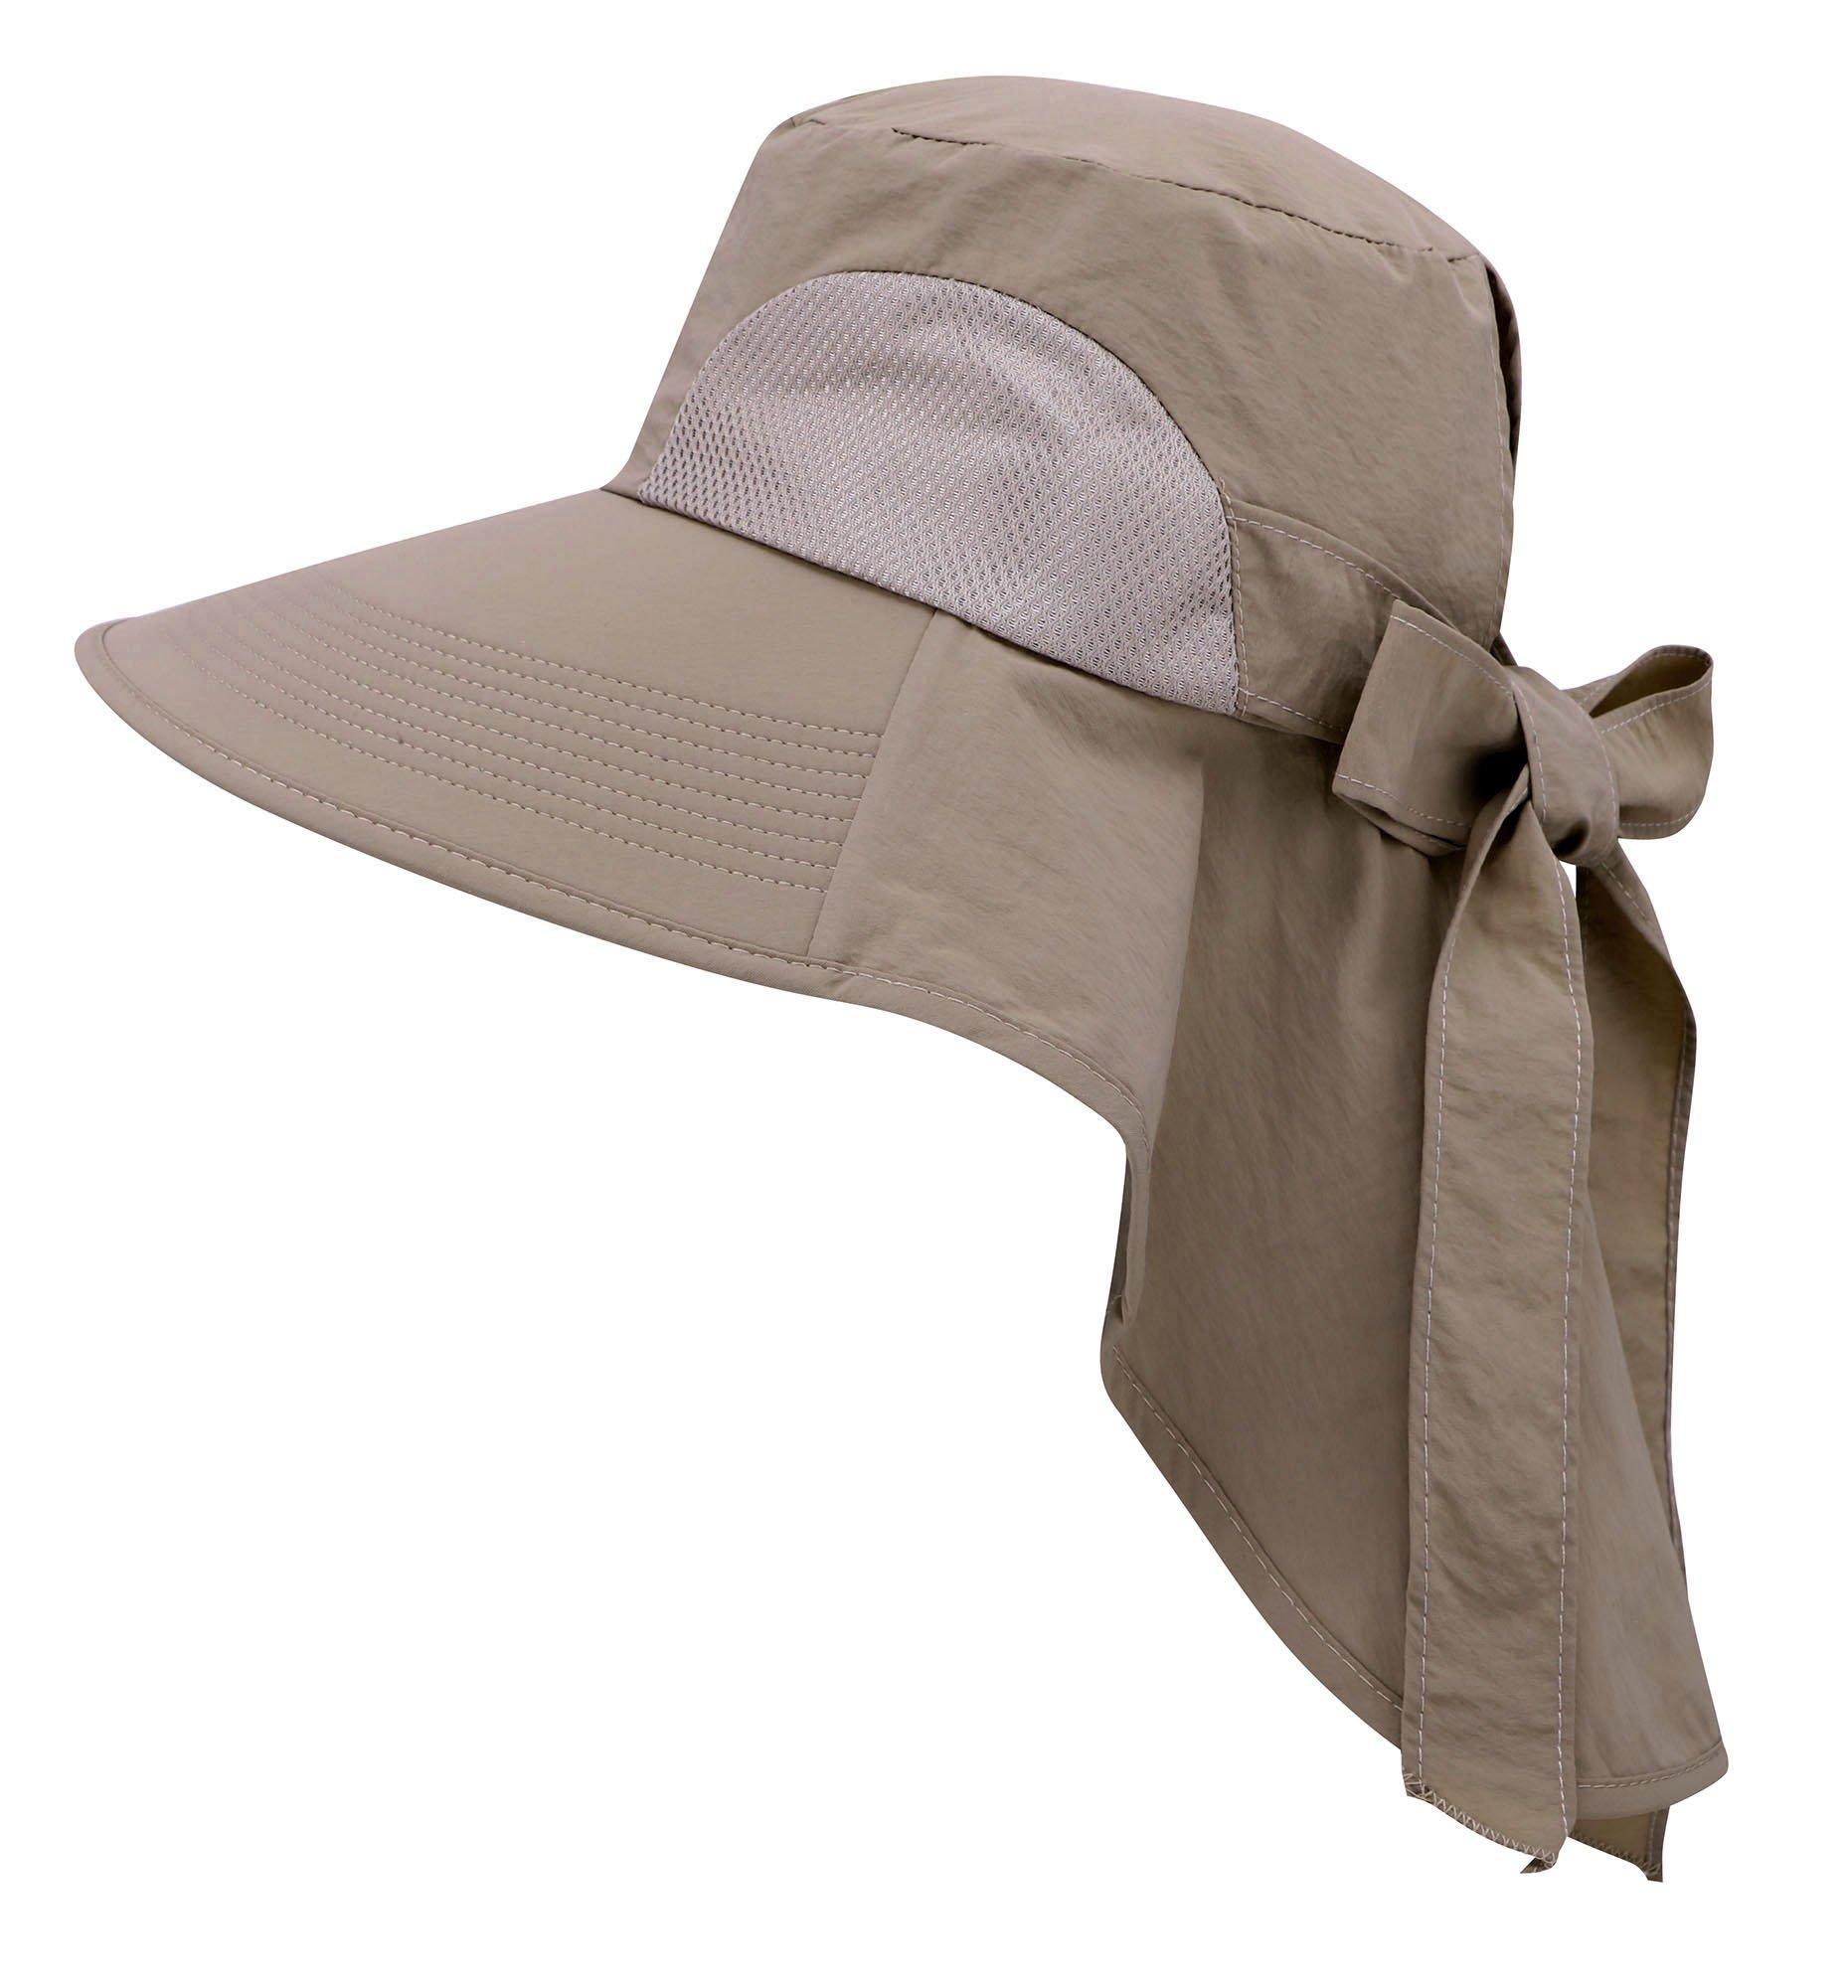 Jasmine Sun Hat Womens Foldable Flap Cover UPF 50 UV Protective Bucket Hat,Khaki